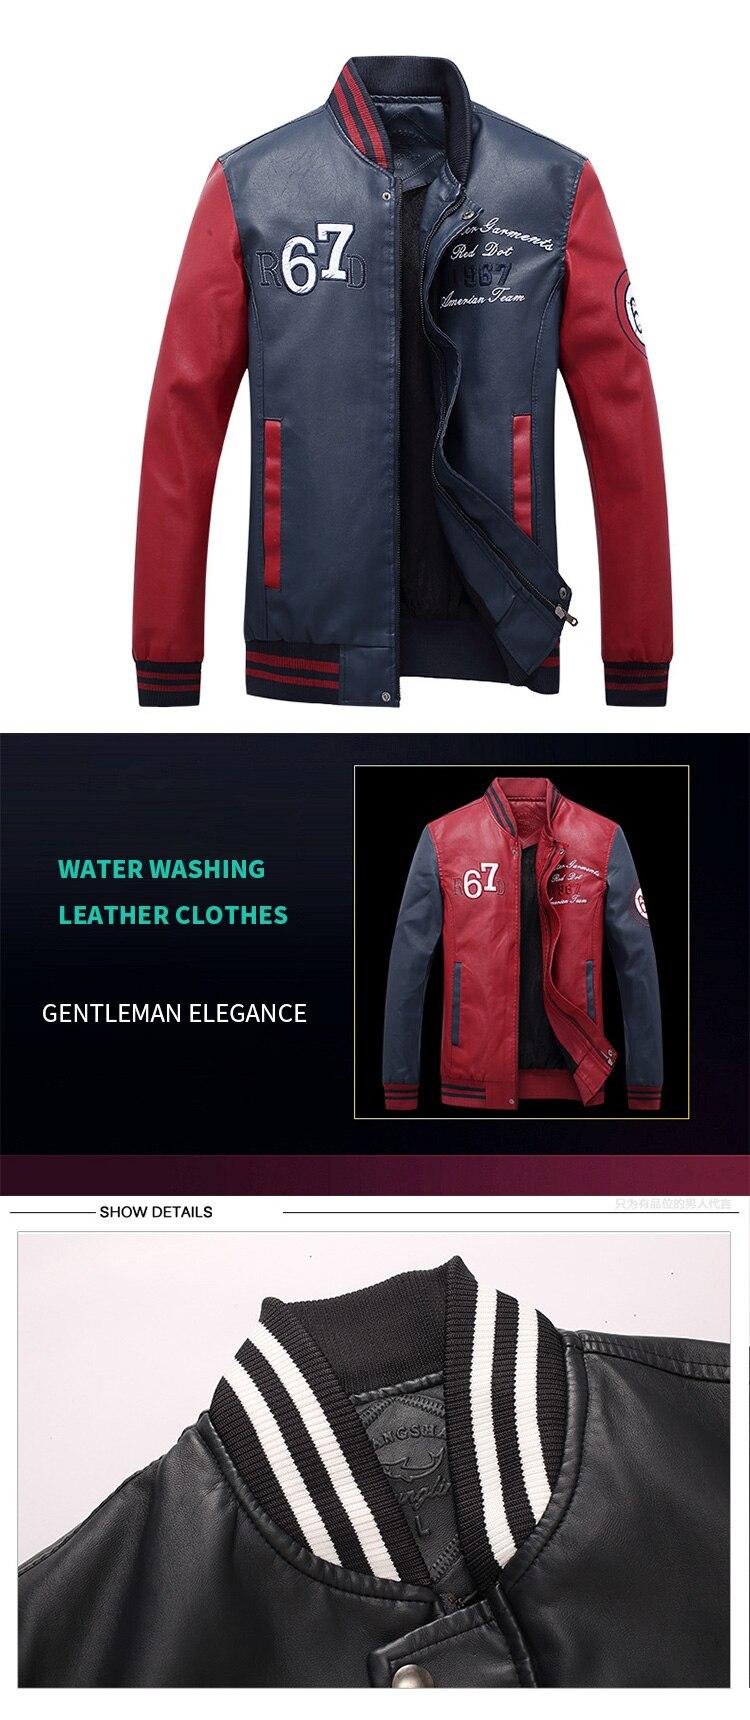 HTB1oUbwbUGF3KVjSZFmq6zqPXXaF New Men Pu Faux Leather Jacket 2019 Brand Embroidery Baseball Jackets Male Casual Luxury Winter Warm Fleece Pilot Bomber Coat